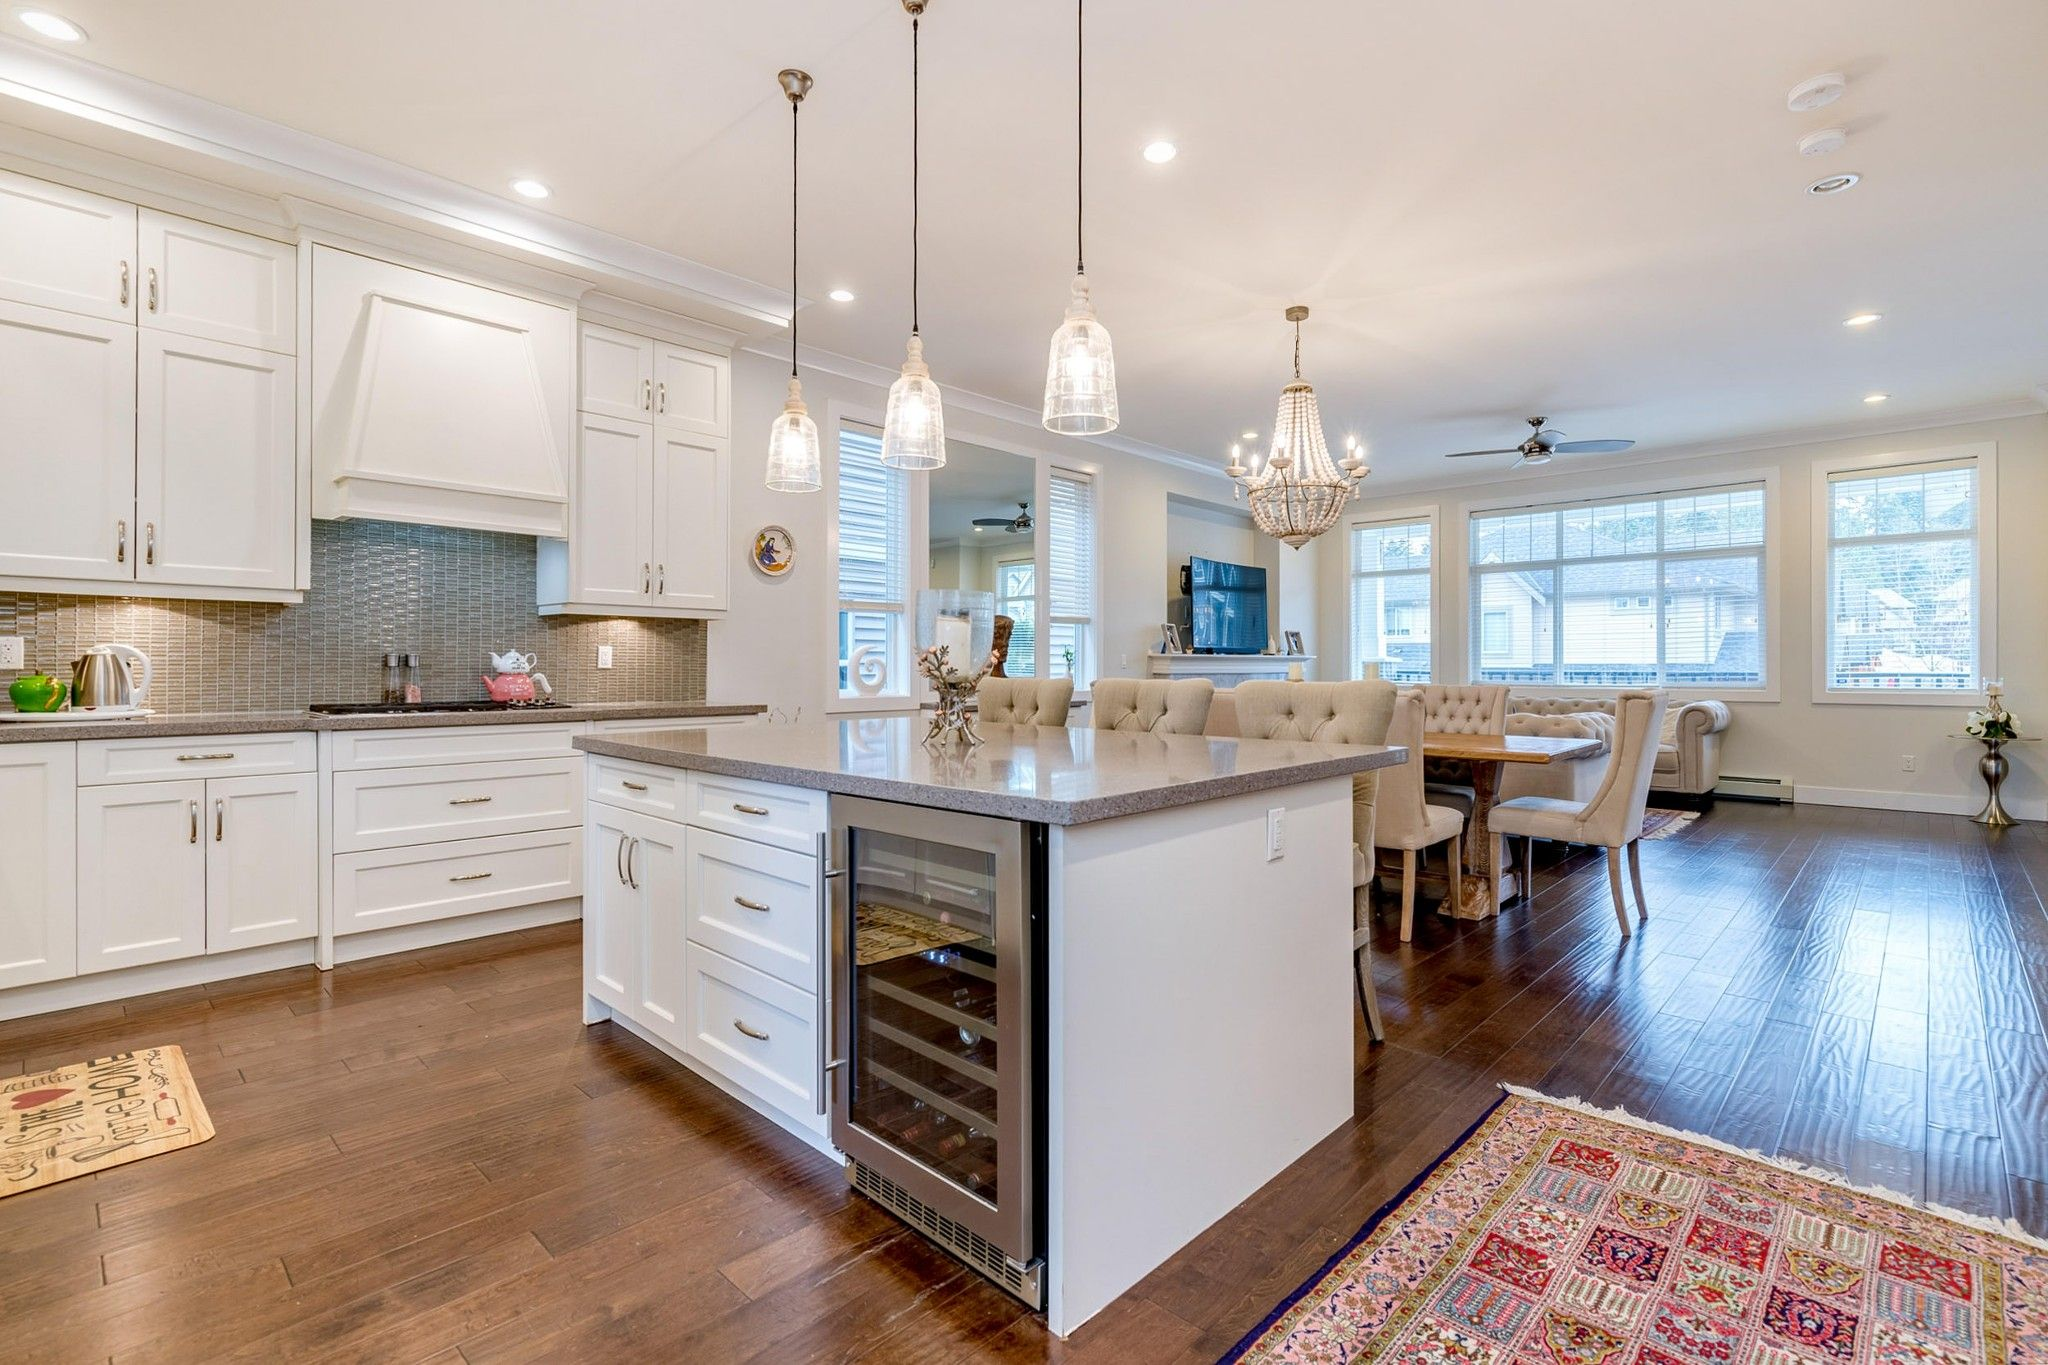 Photo 9: Photos: 1303 Hollybrook Street in Coquitlam: Burke Mountain House for sale : MLS®# R2423196